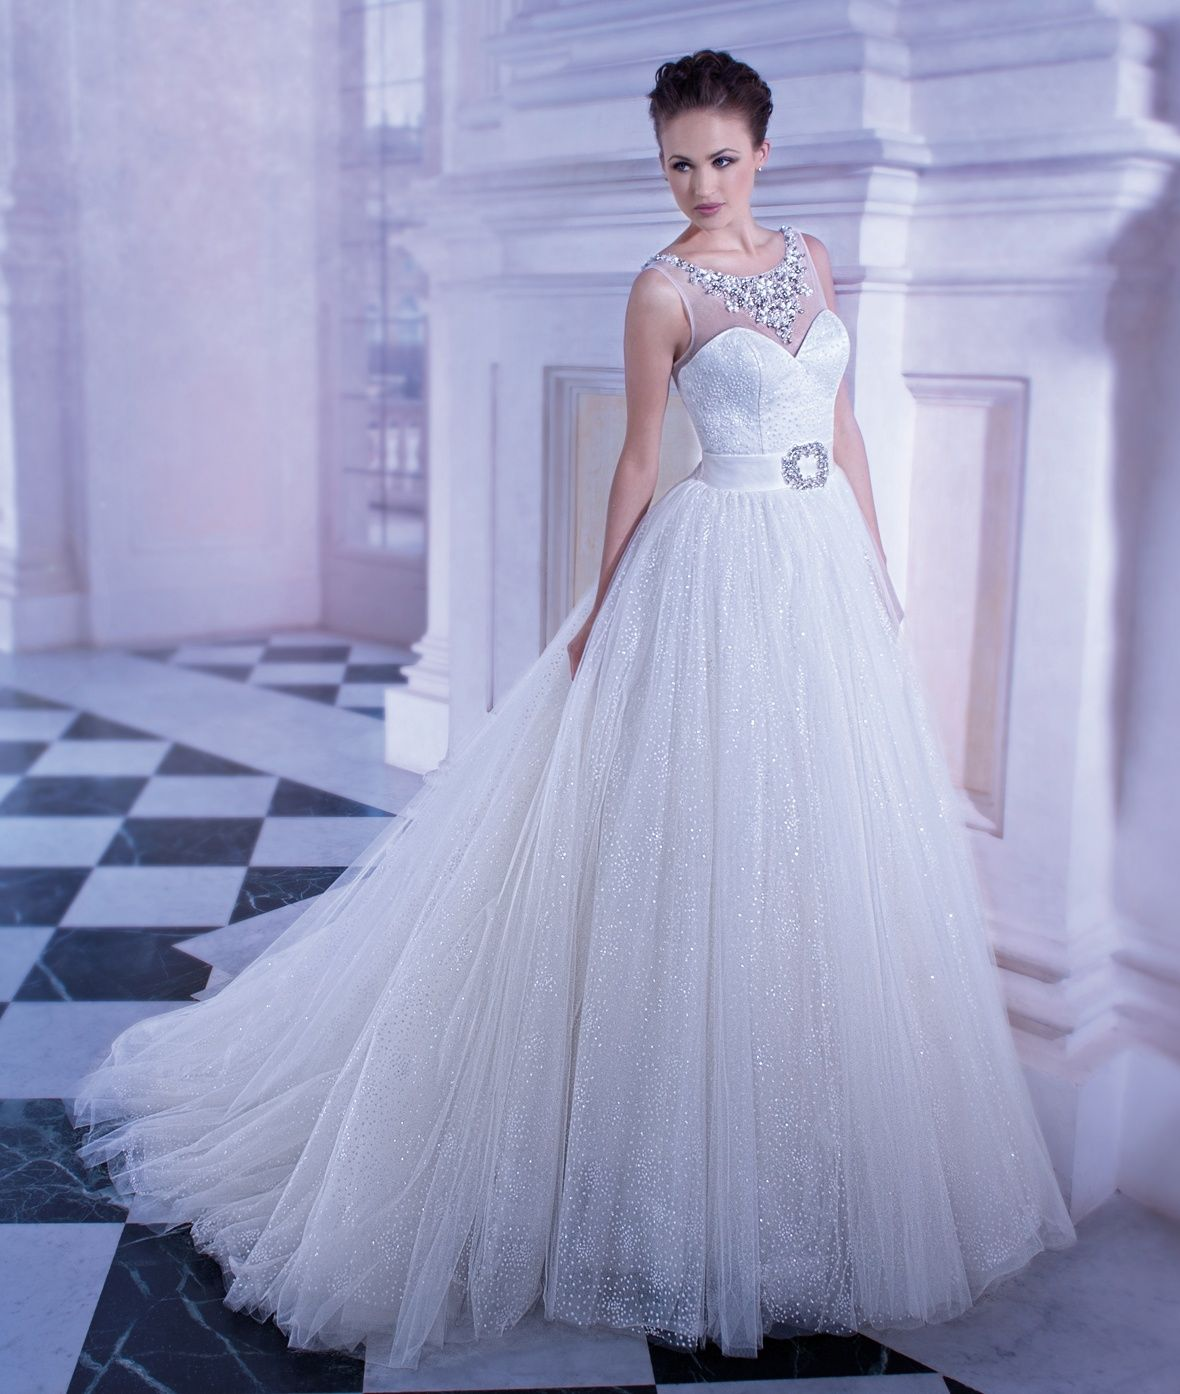 Dimitri Wedding Gowns: Demetrios Wedding Gown Style 555, Ilissa Collection